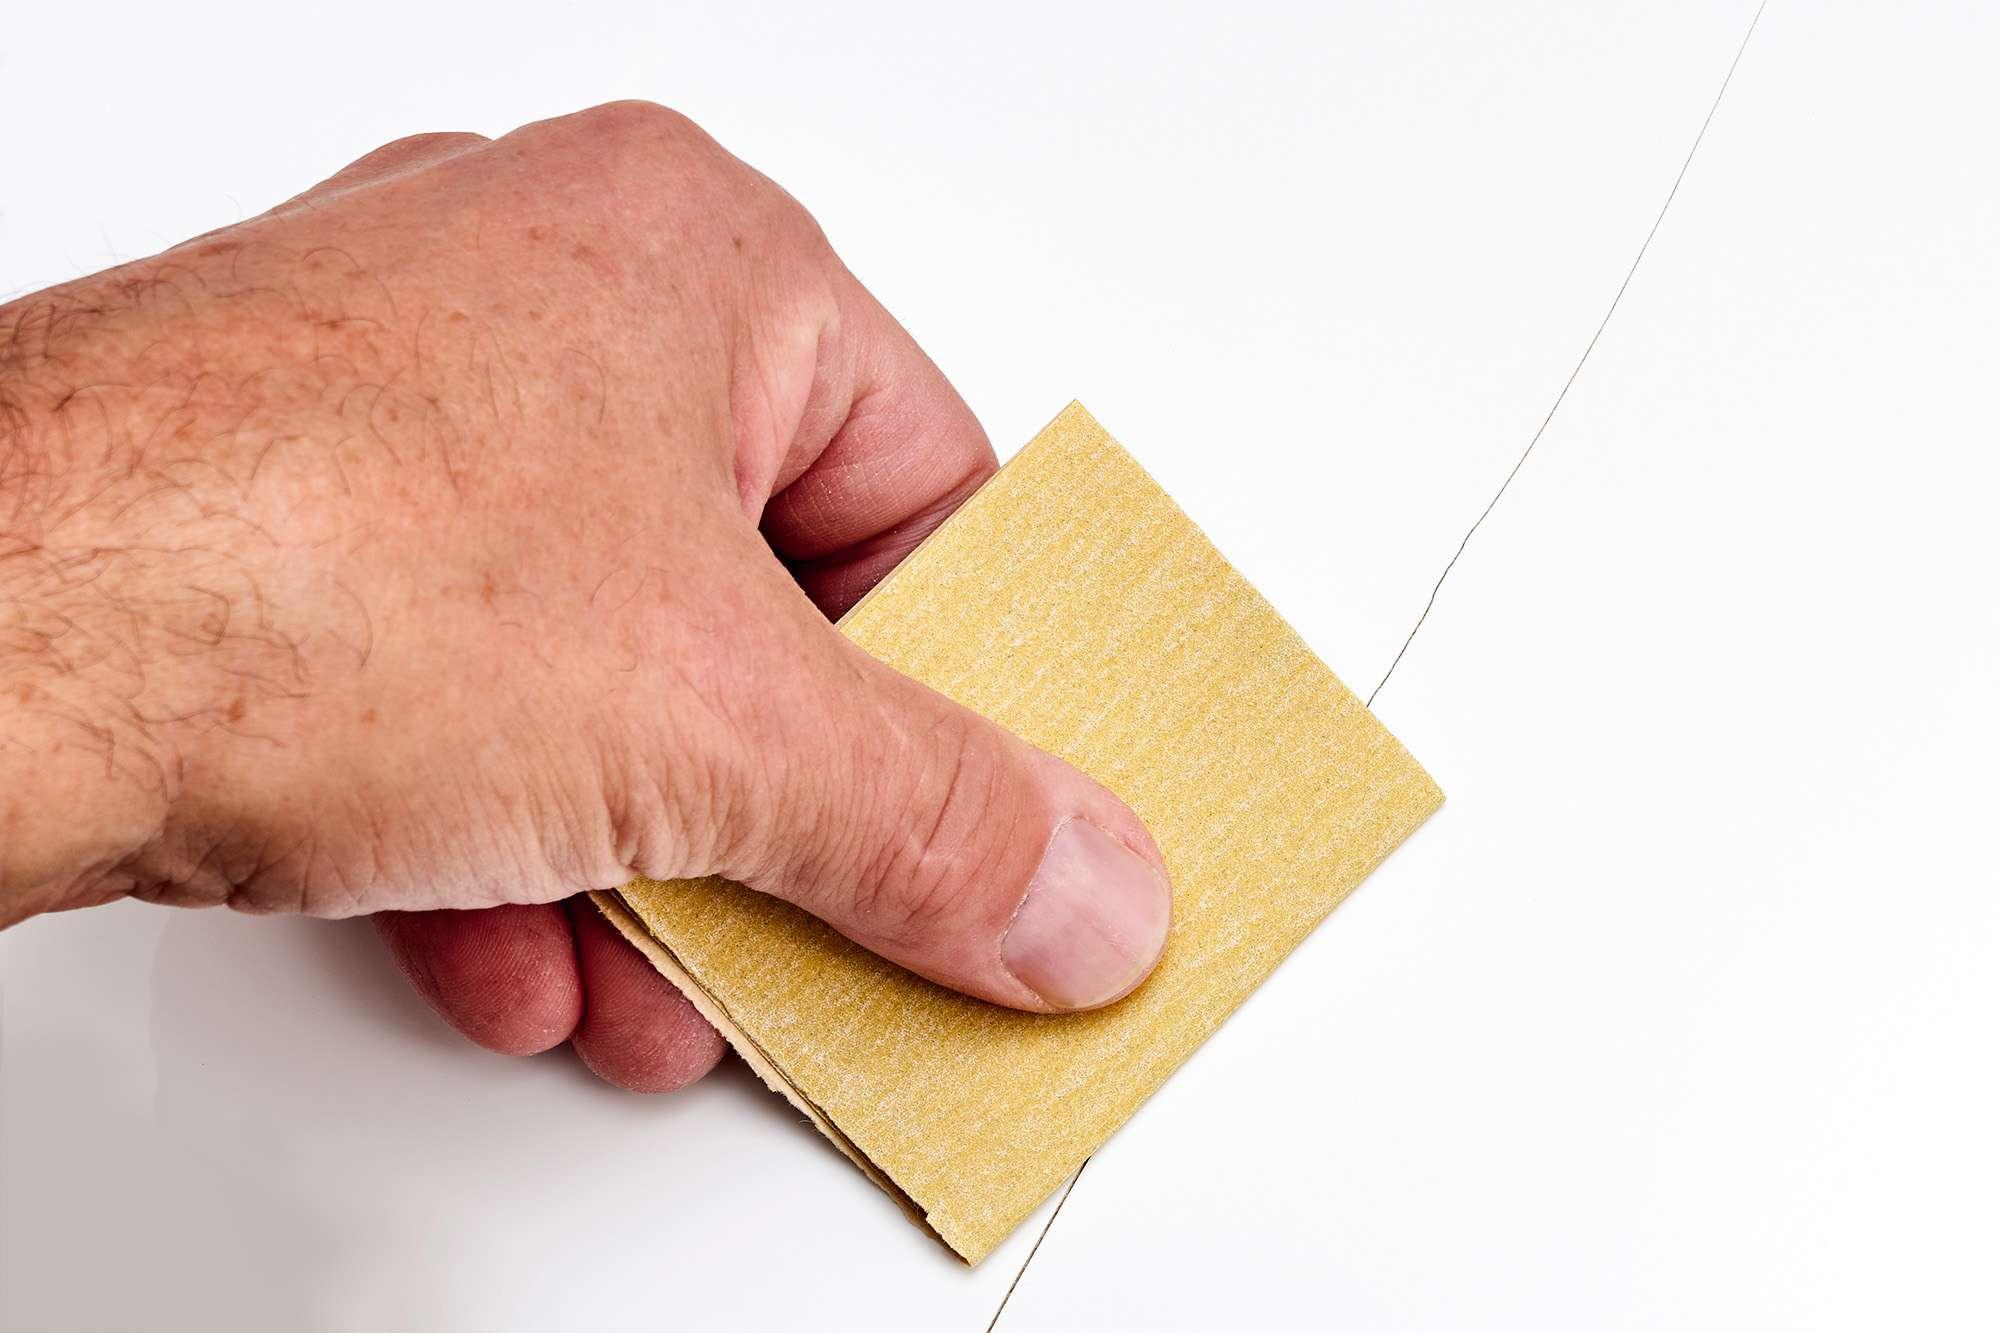 Sandpaper roughening hairline crack surface area on toilet bowl or tank